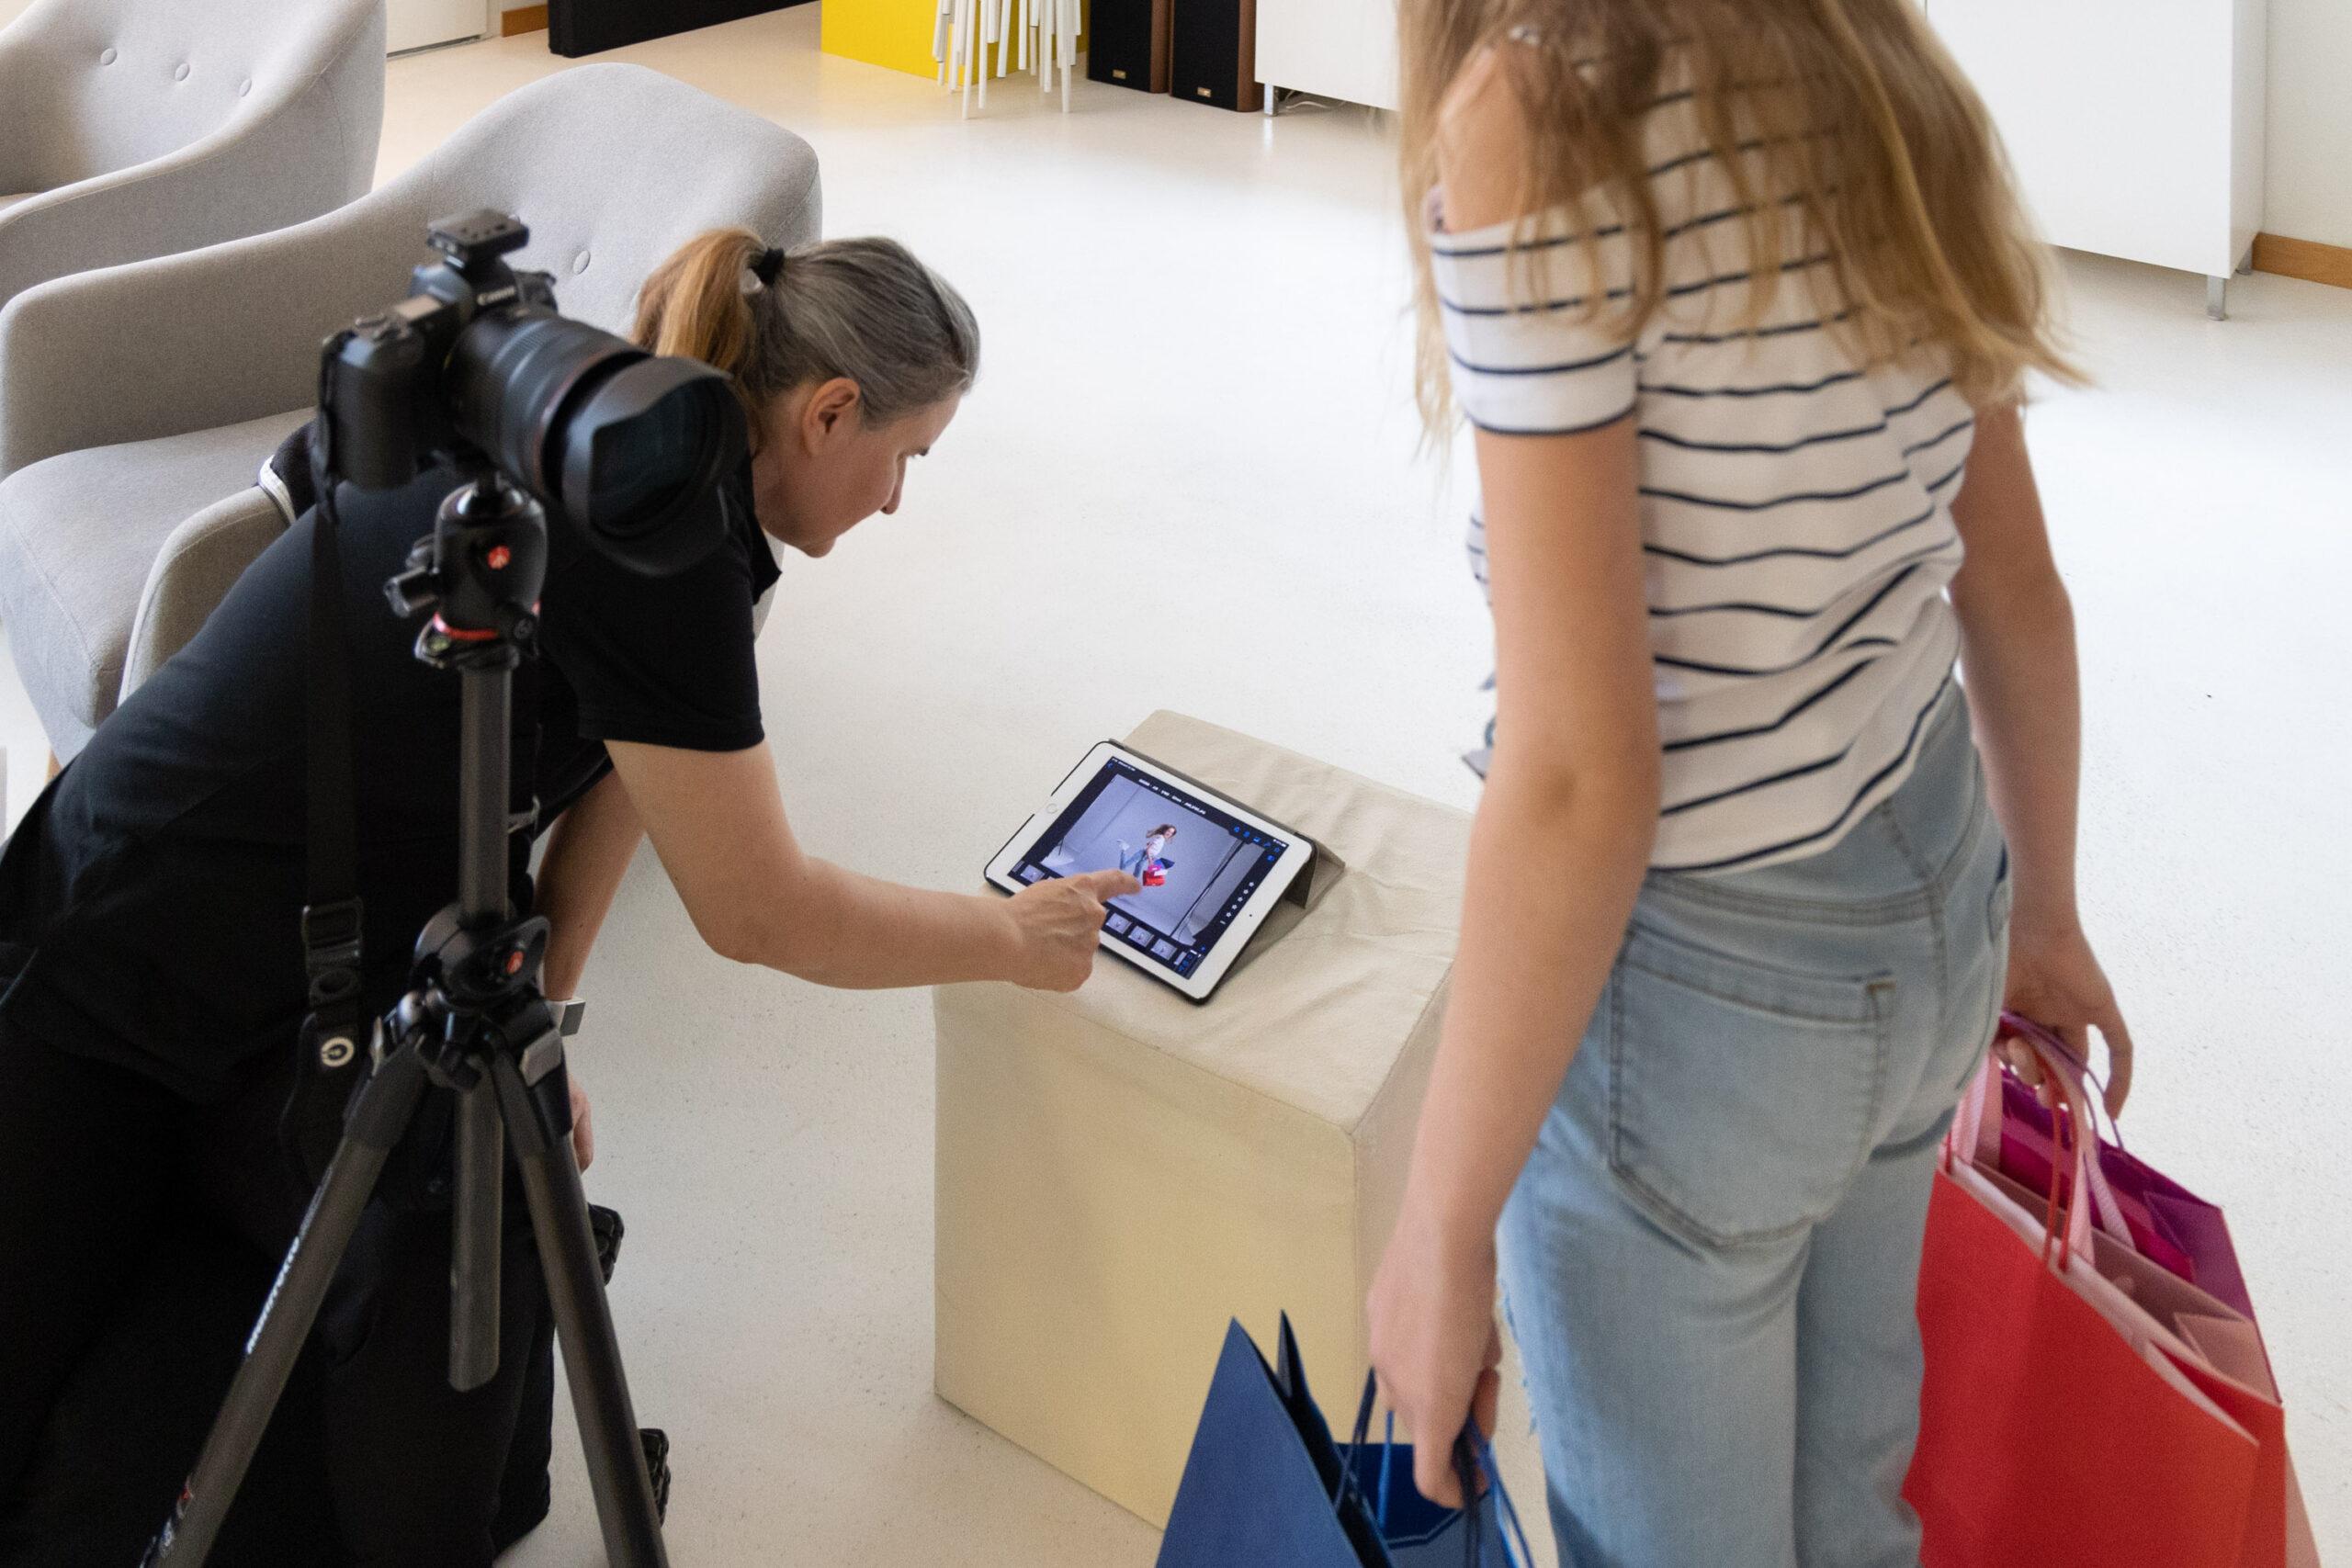 Making-of im Fotostudio Blatthirsch Seewen - Model Jana mit Fotografin Jeannette Meier Kamer - Werbefotografie Werbekampagne Rein ins Leben fürs Mythen Center Schwyz - Fotografie, Fotograf, Werbefotograf, Goldau, Oberarth KAR_0111